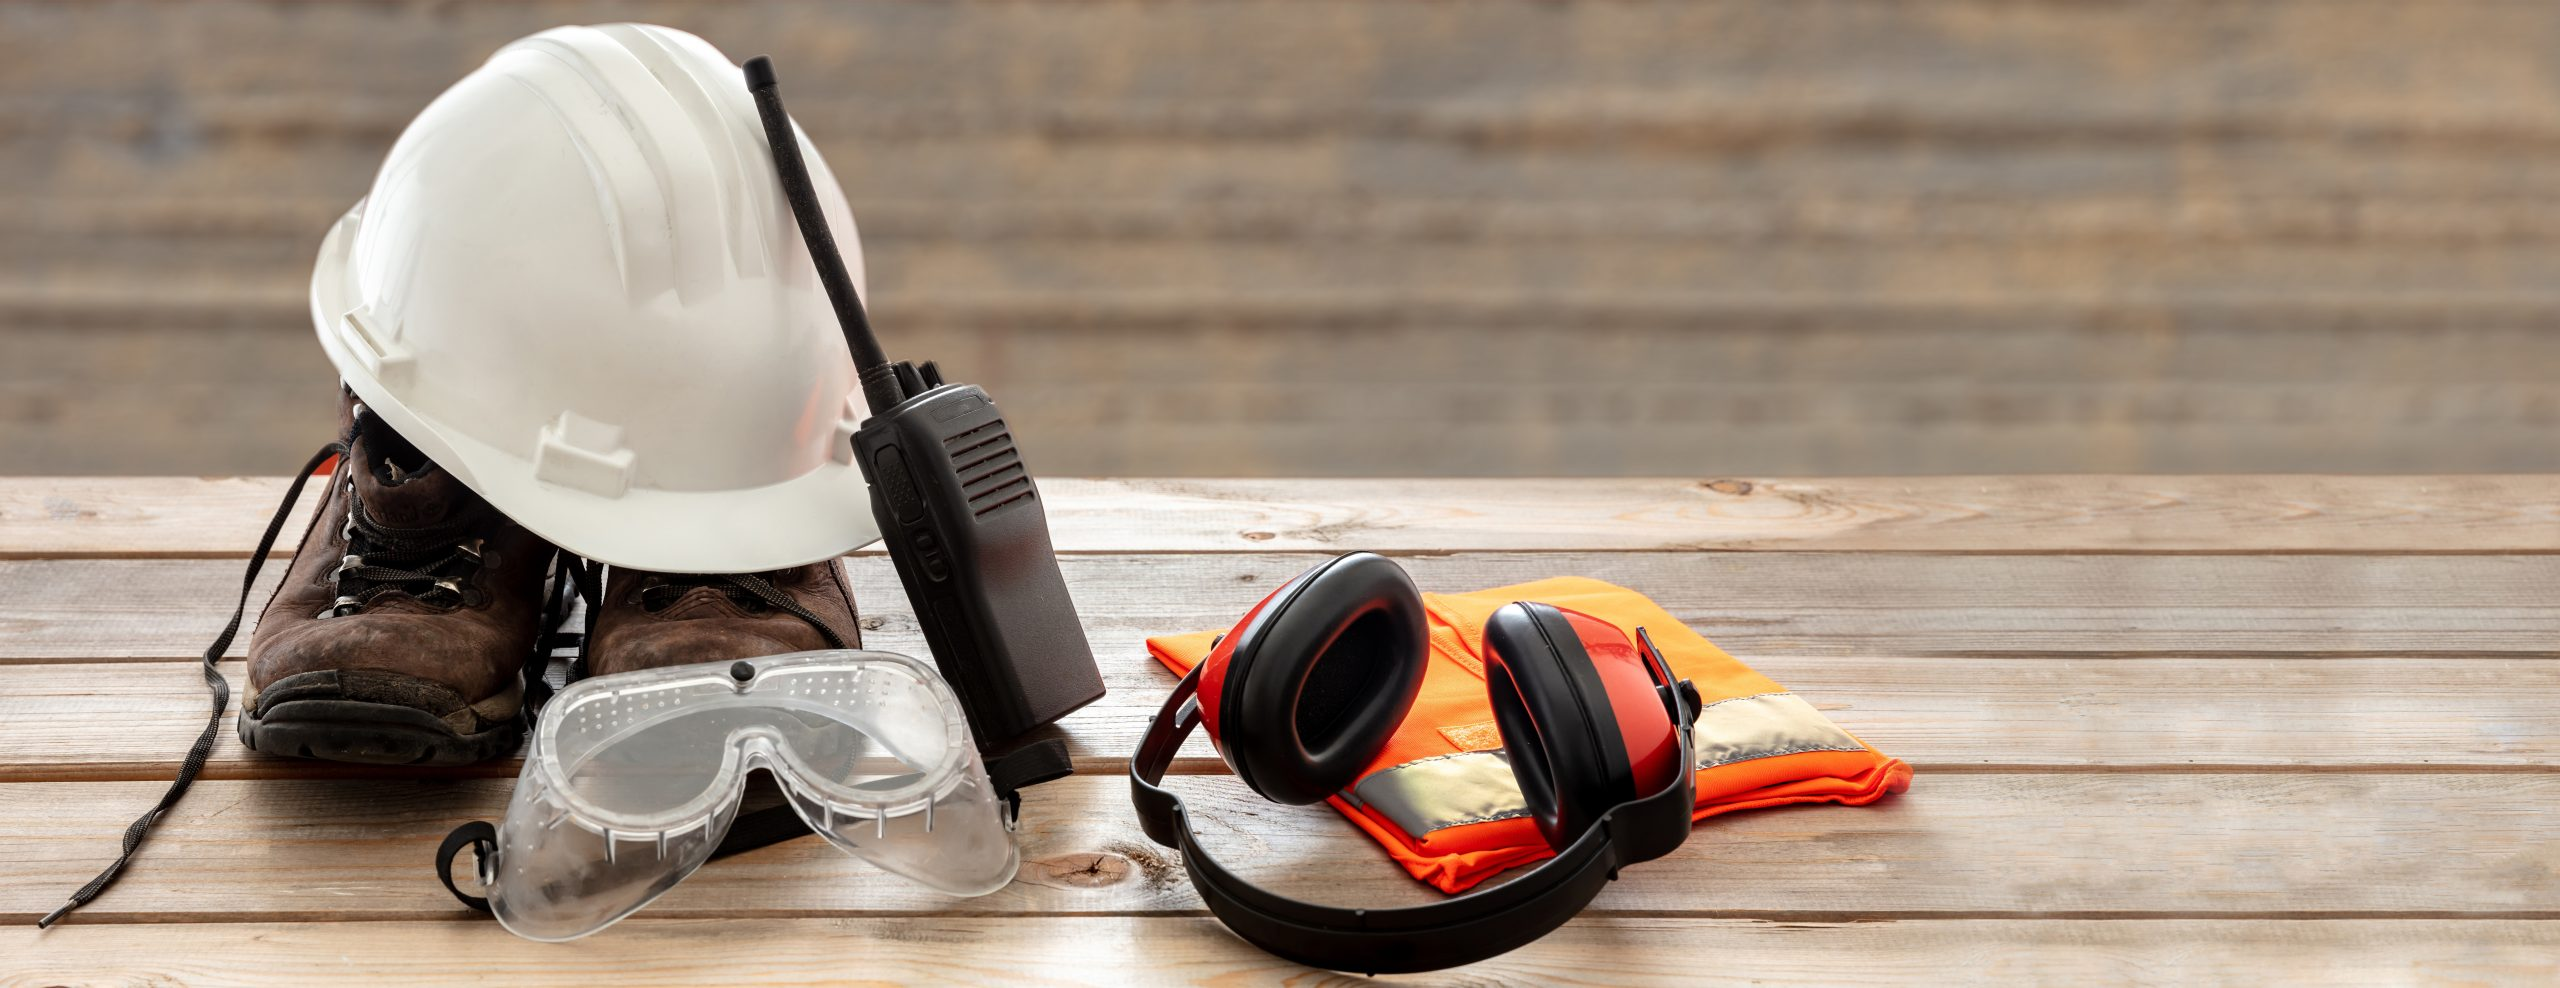 Residential Construction Essentials